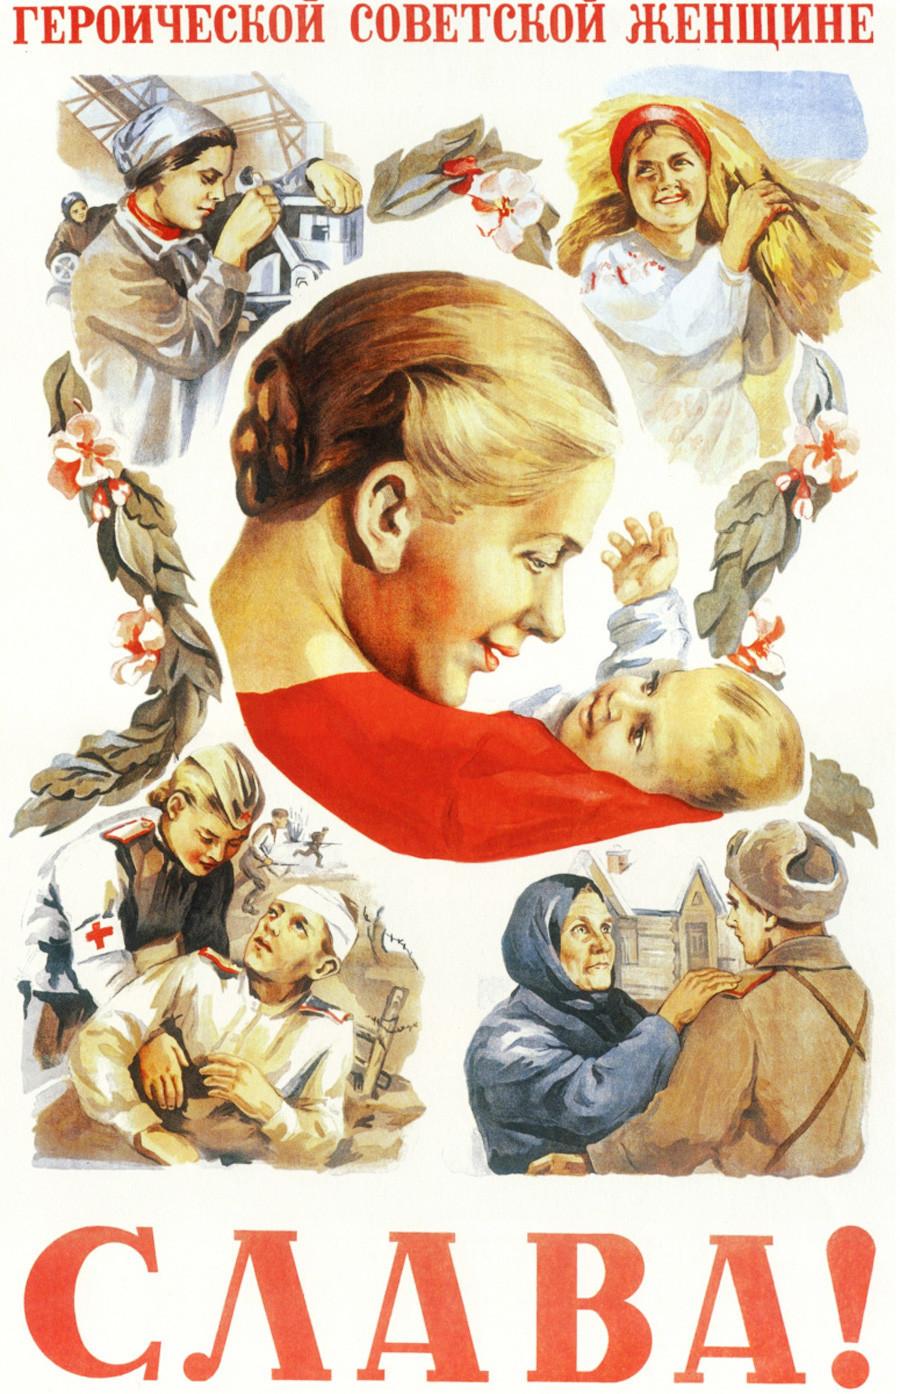 Glória à heróica mulher soviética